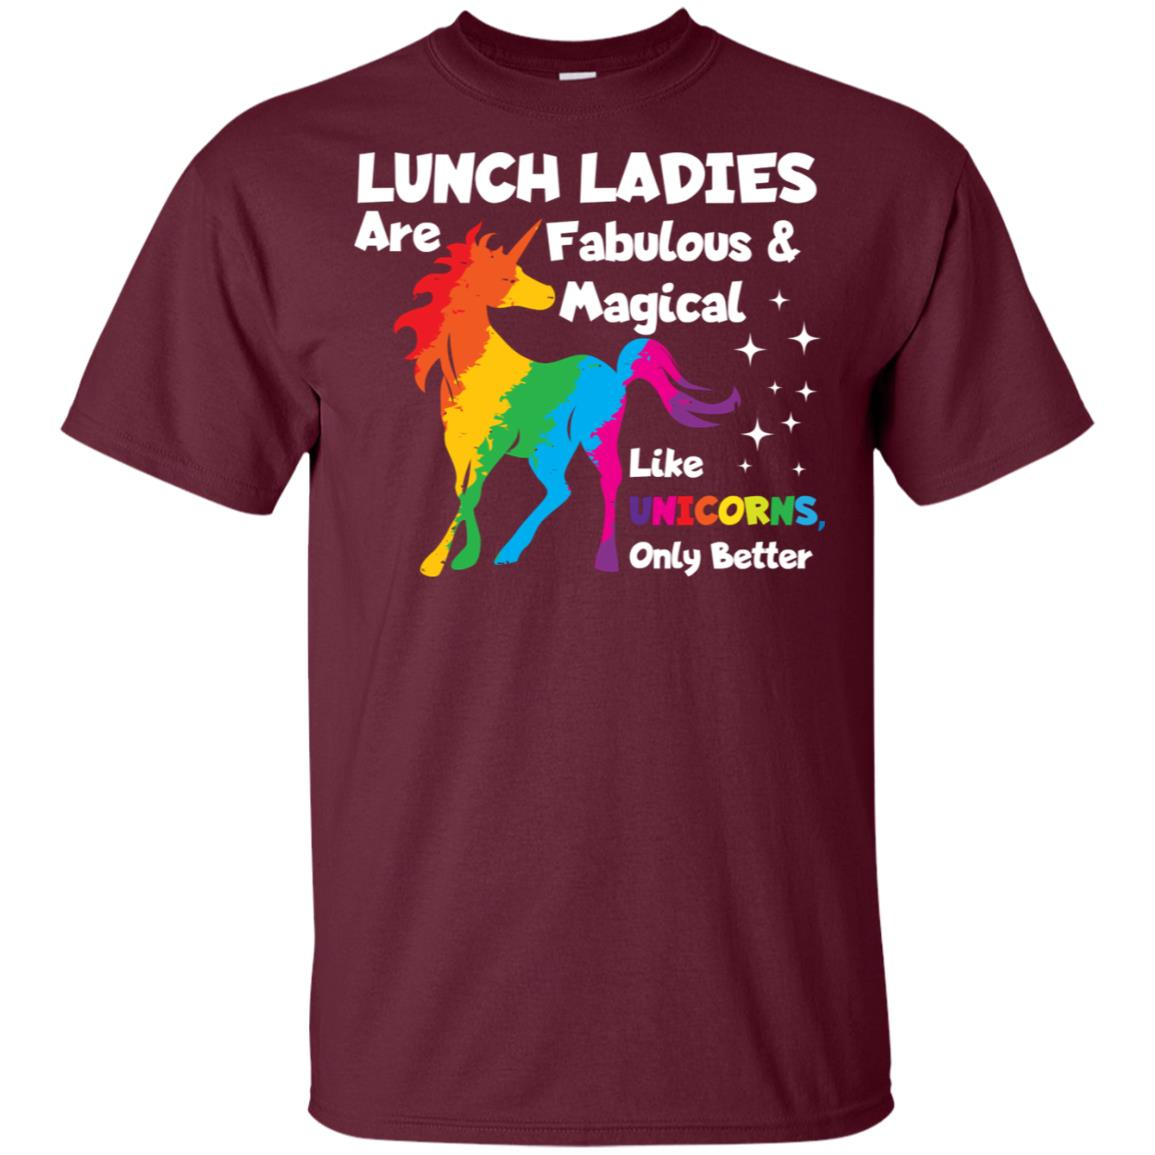 Lunch Ladies Are Fabuluos & Magical Unicorn Gift Unisex Short Sleeve